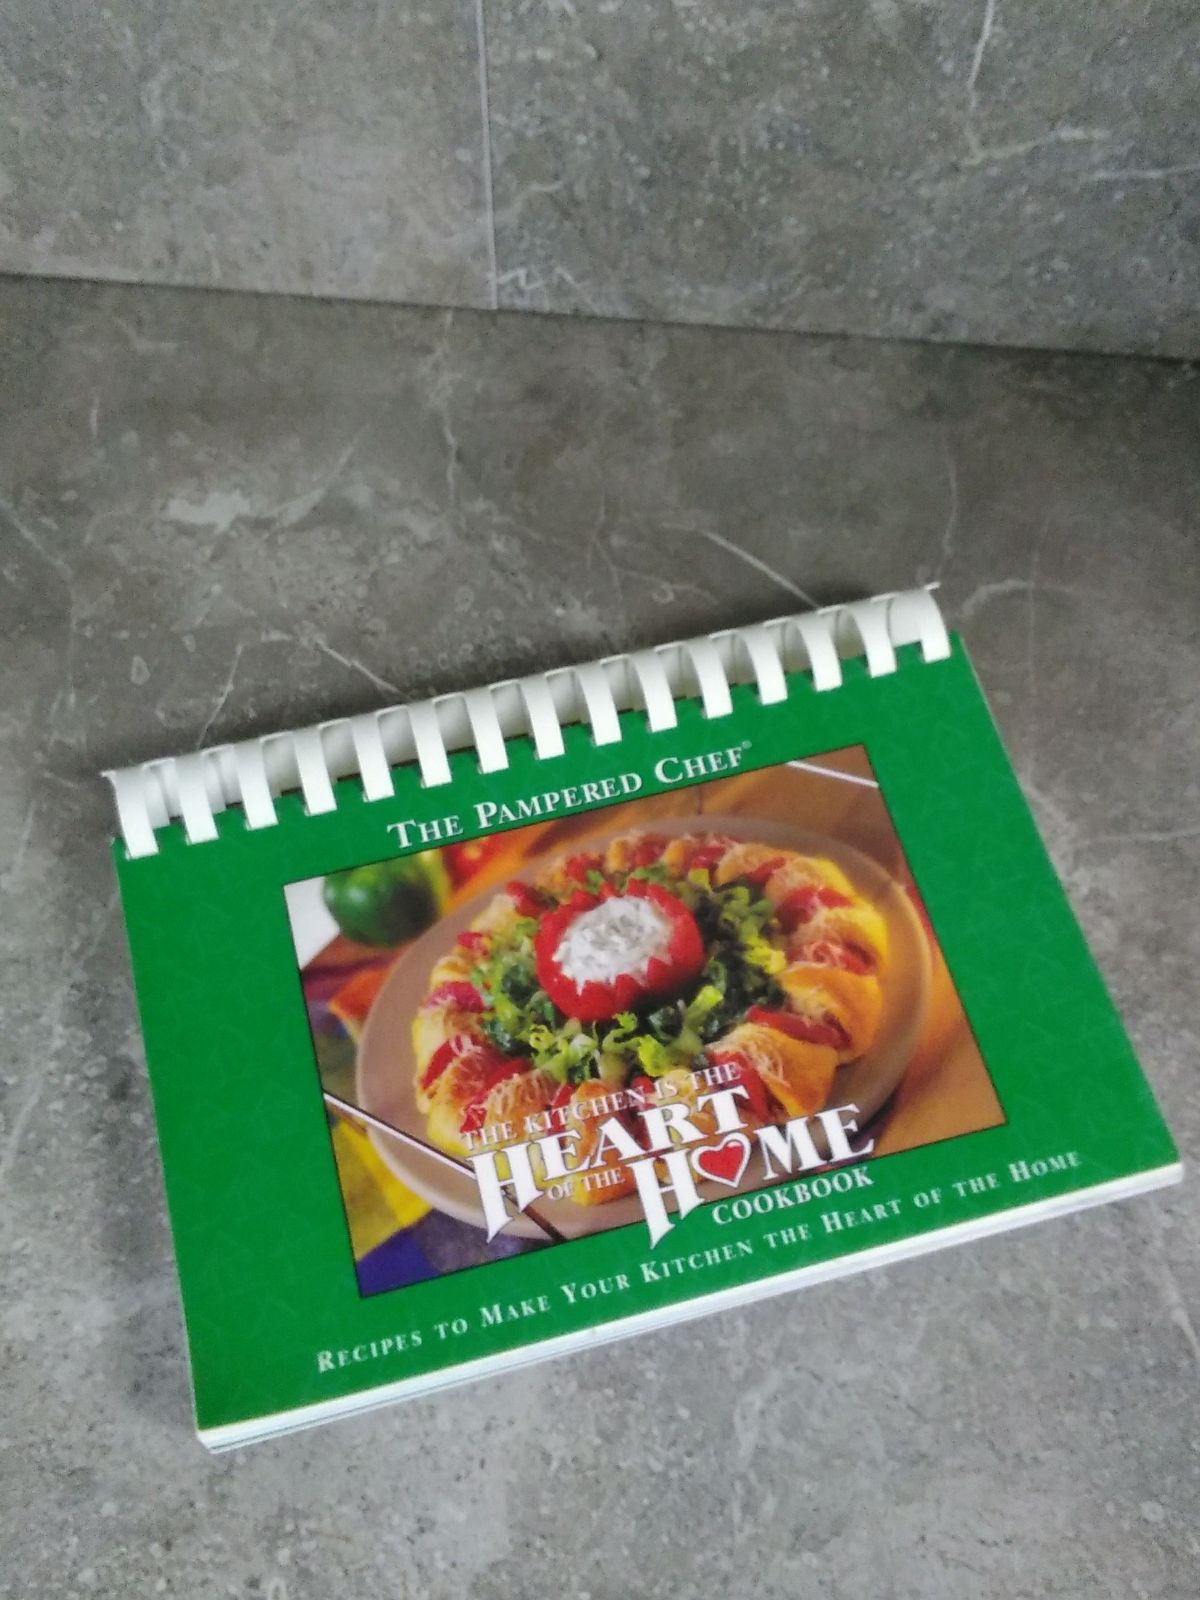 Pampered Chef Cookbook